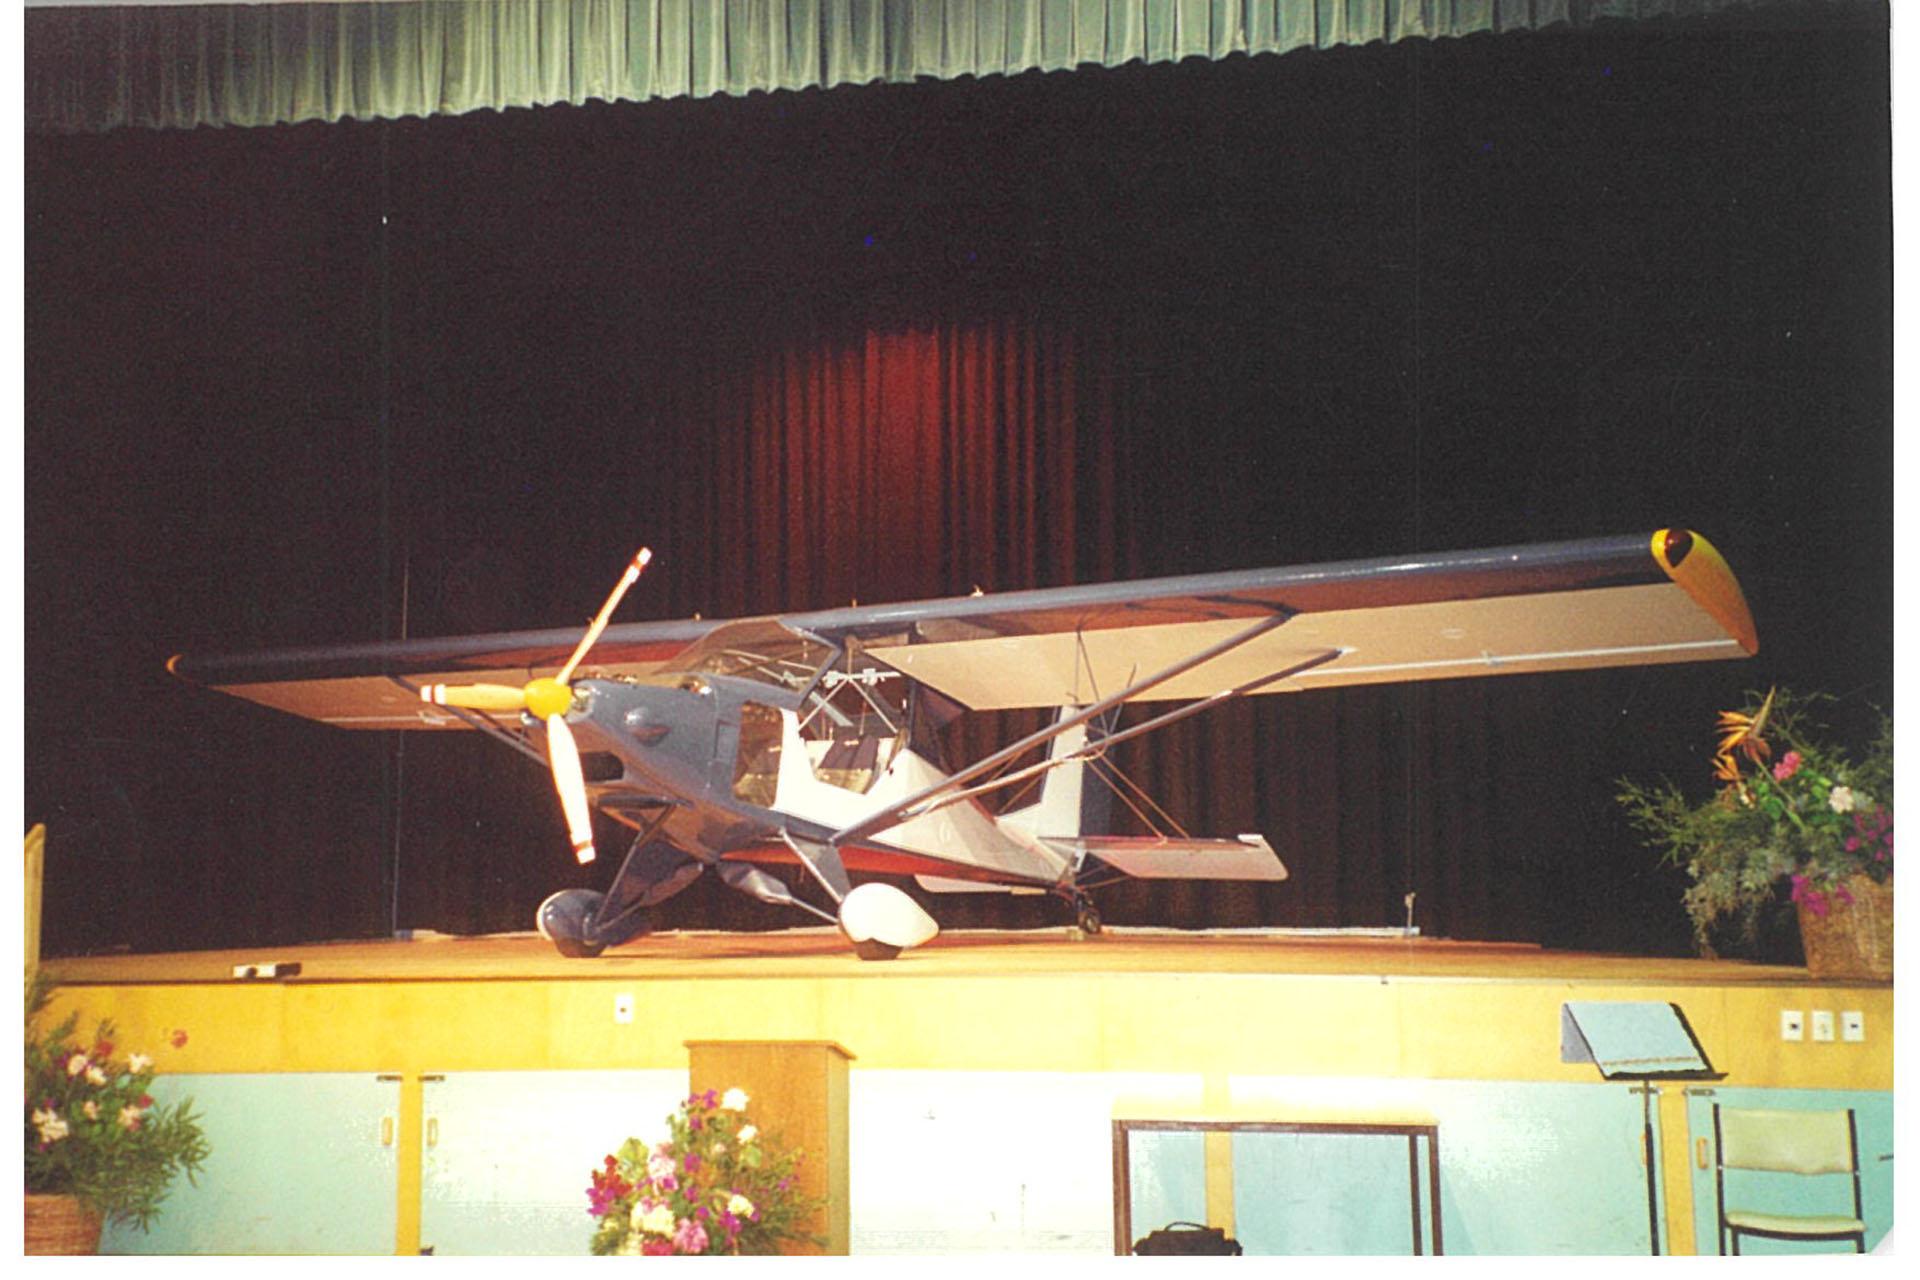 Lightwing hughes aircraft